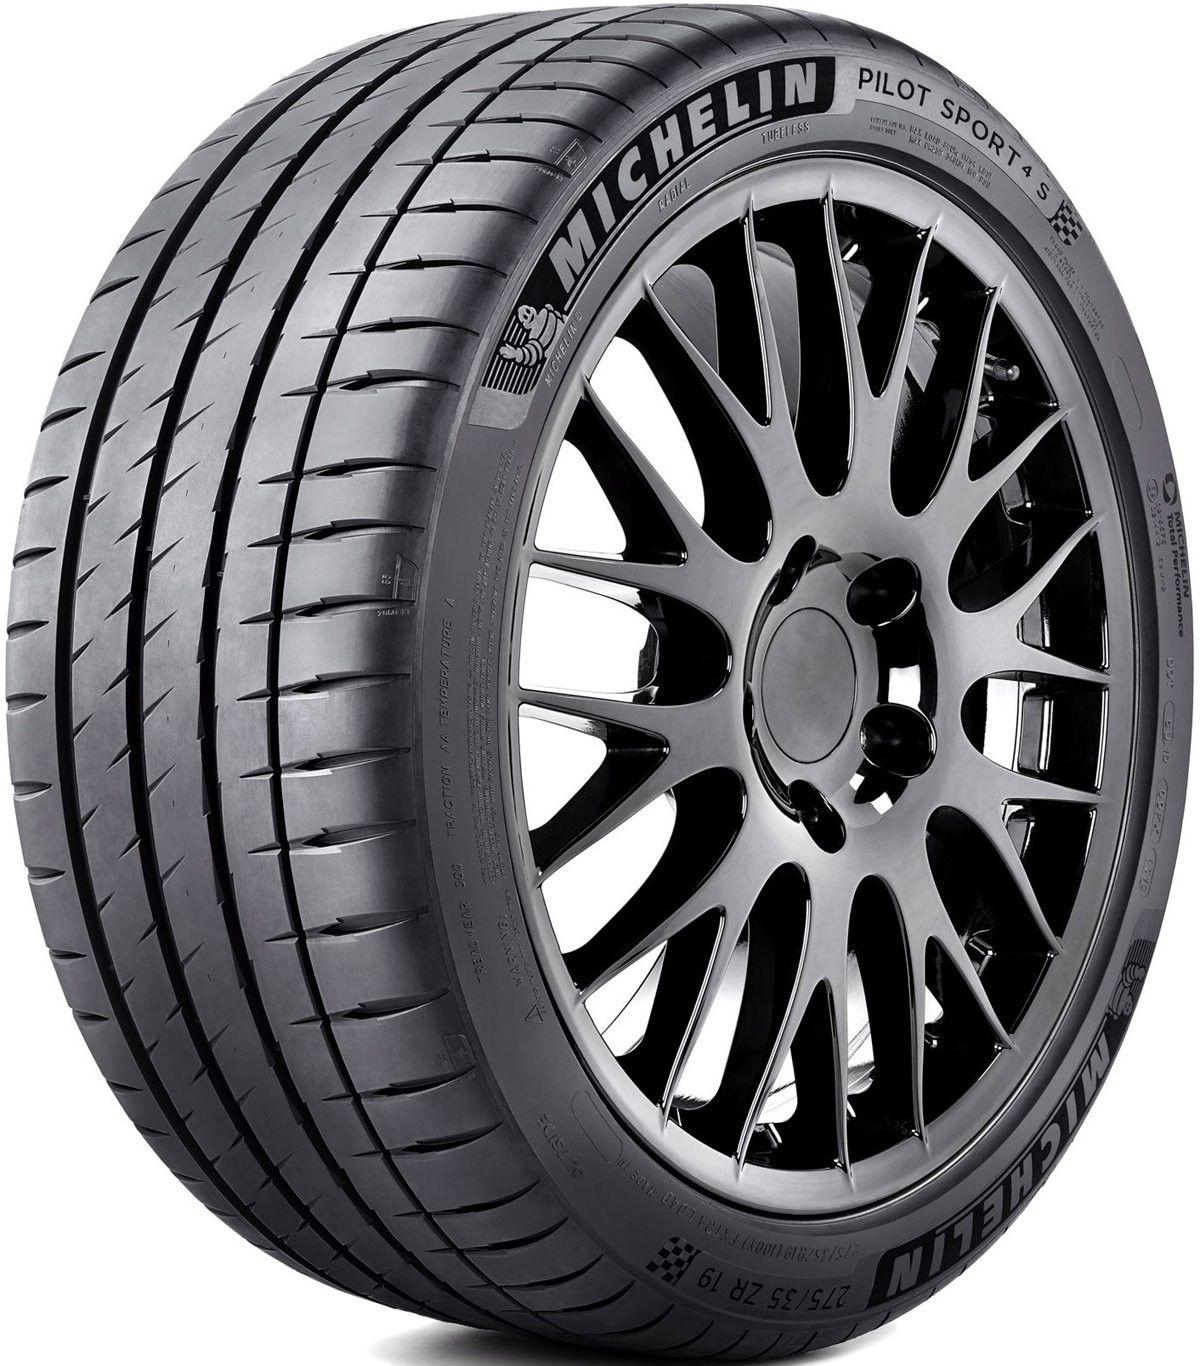 Michelin PILOT SPORT 4 S 235/40 R 95